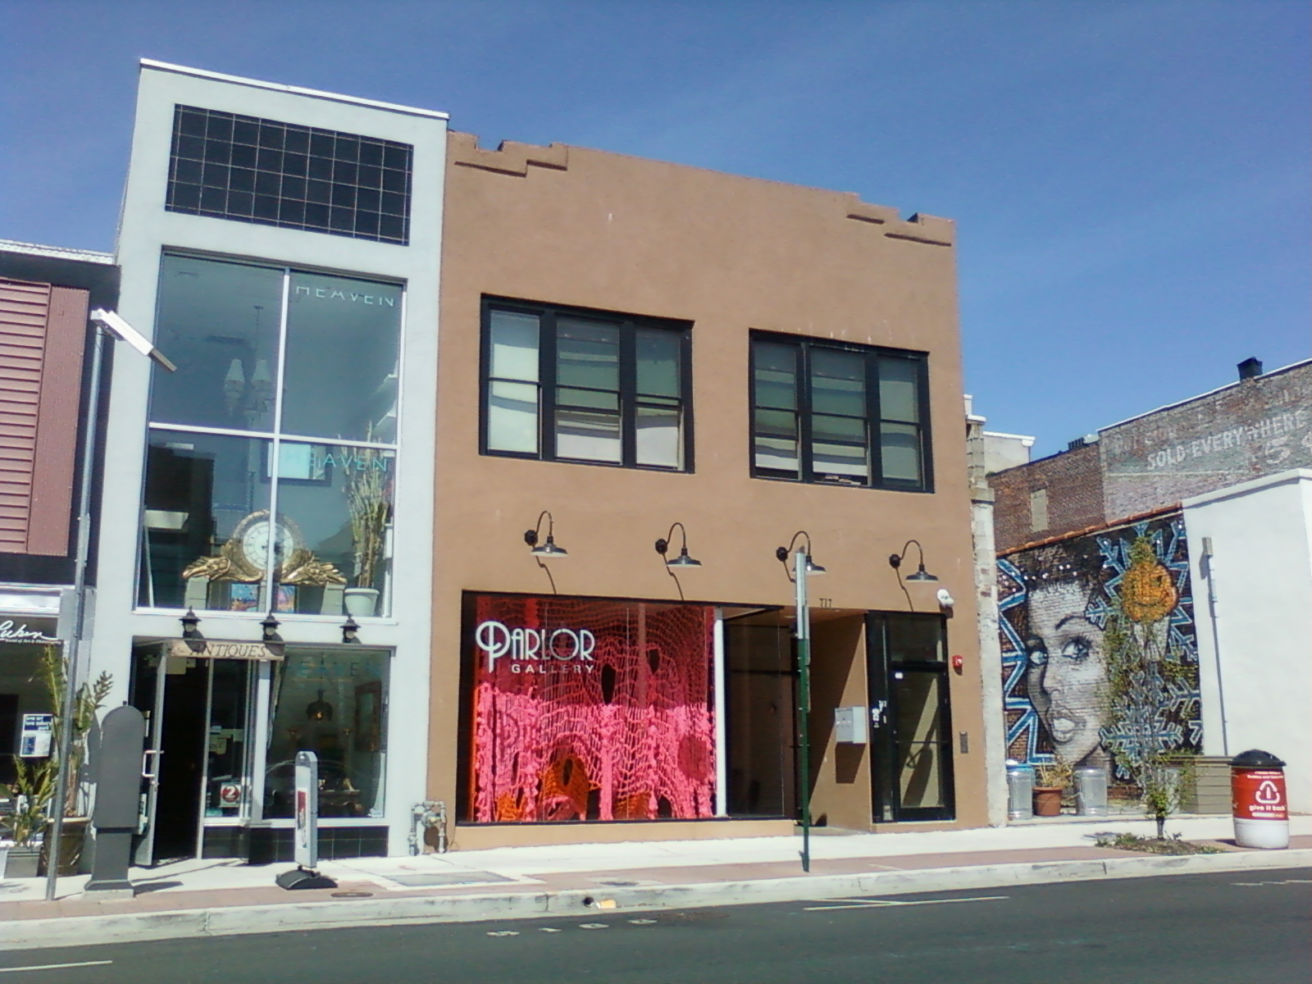 Parlor gallery, Asbury Park, NJ